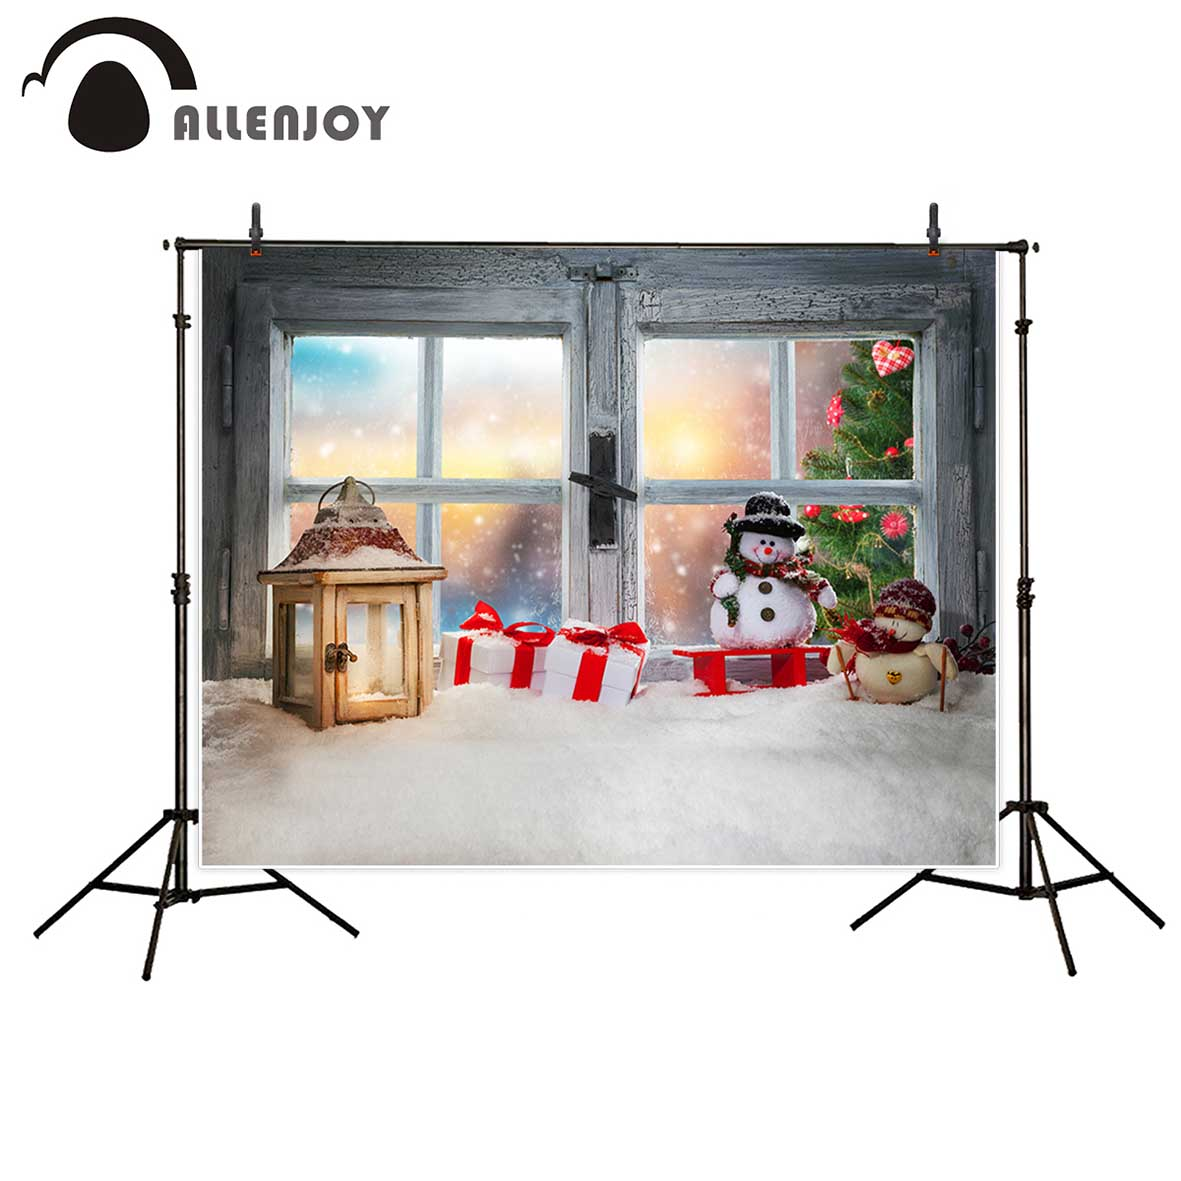 Window Sill Decoration: Aliexpress.com : Buy Allenjoy Photography Background